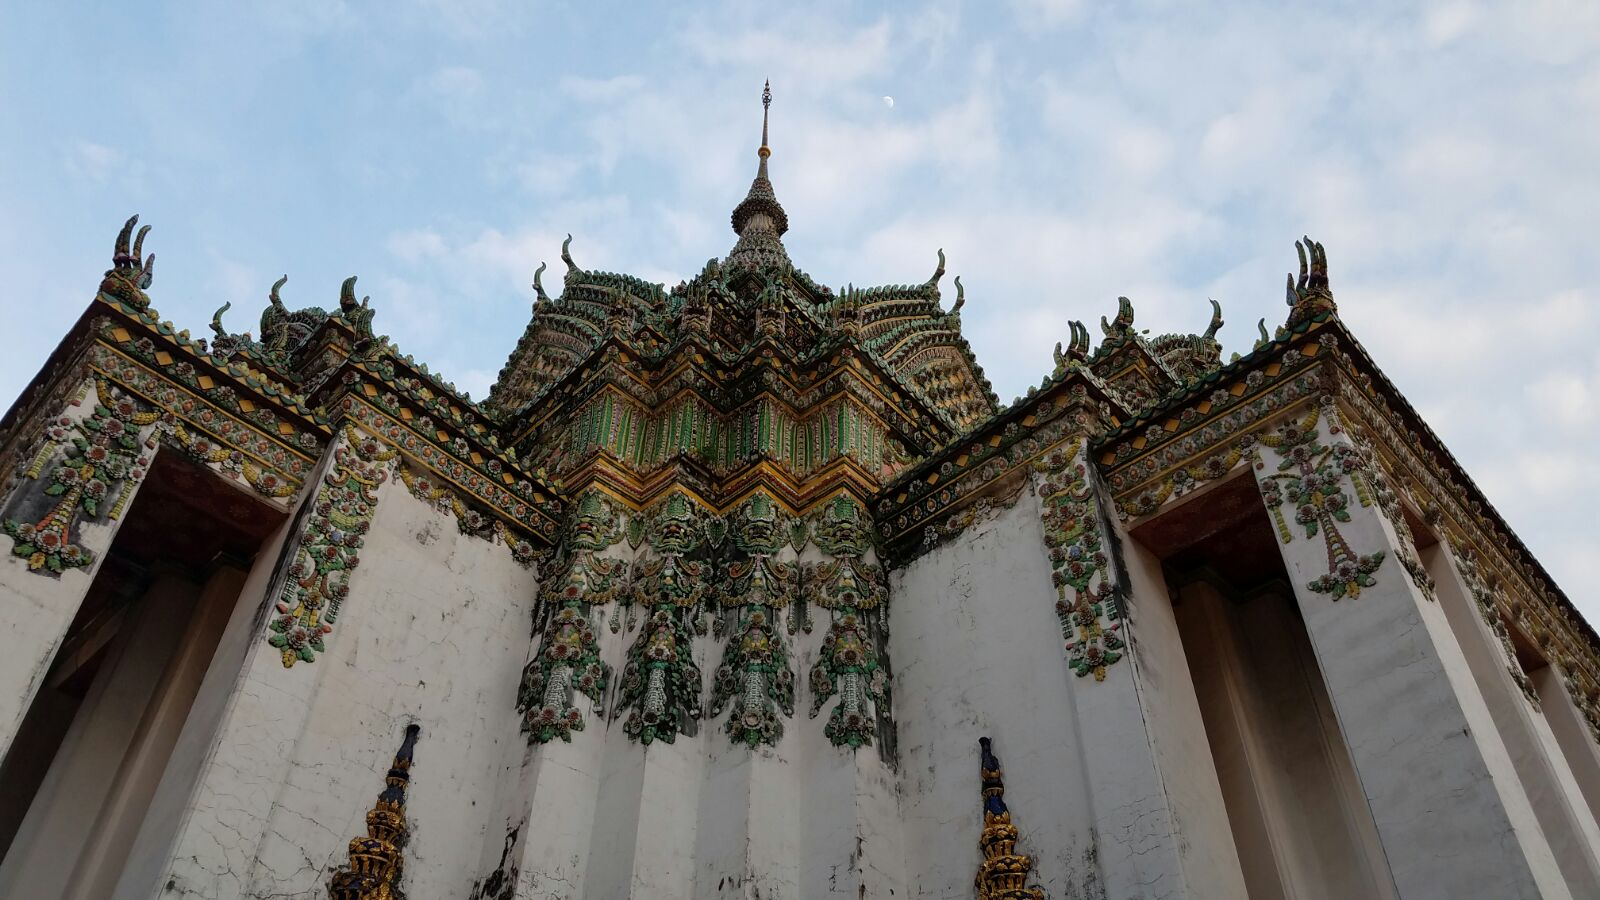 Metal claws at Phra Mondop